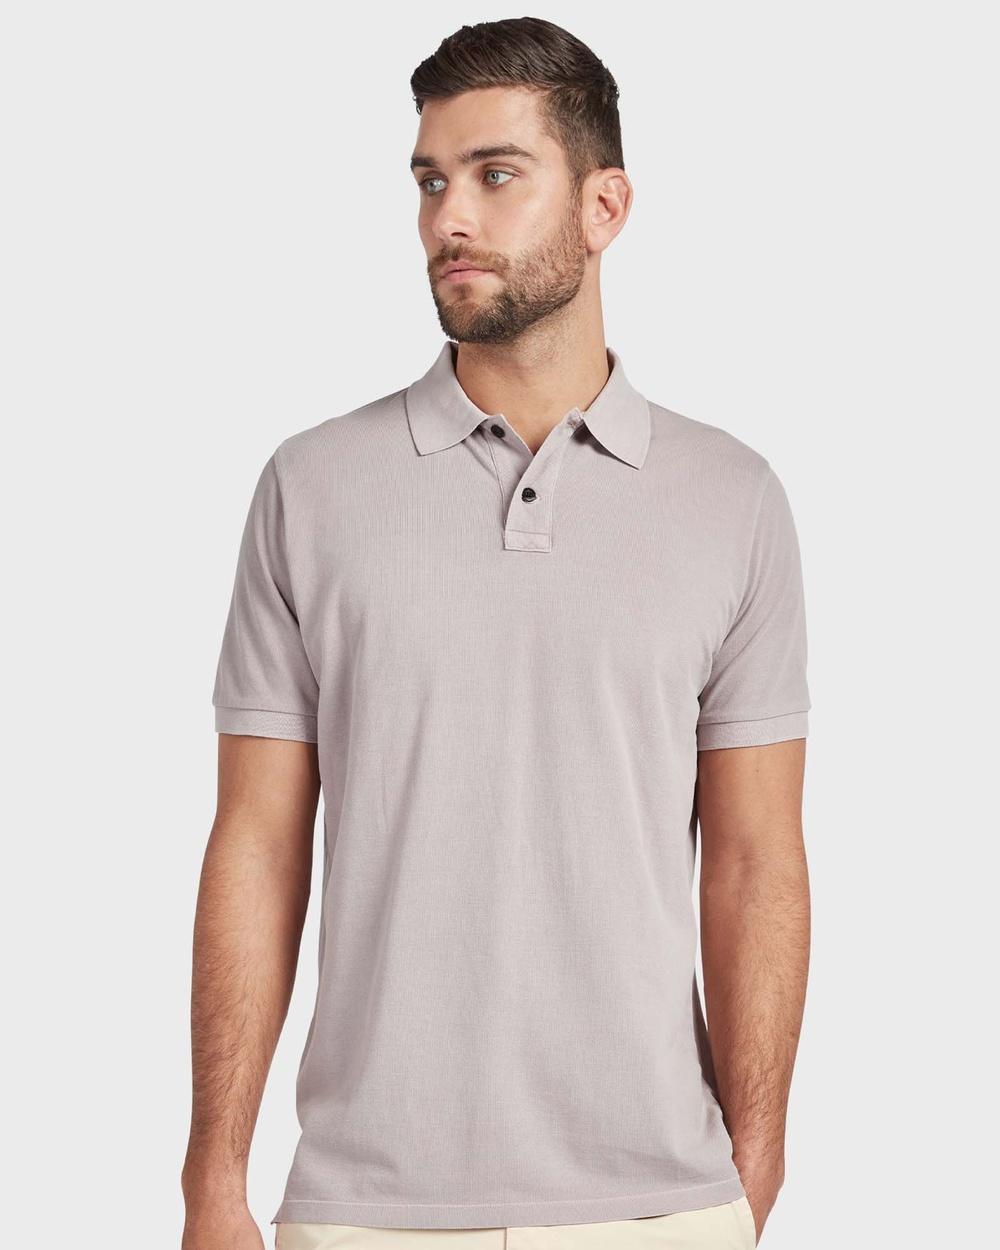 Academy Brand Polo Shirts & Polos Neutrals